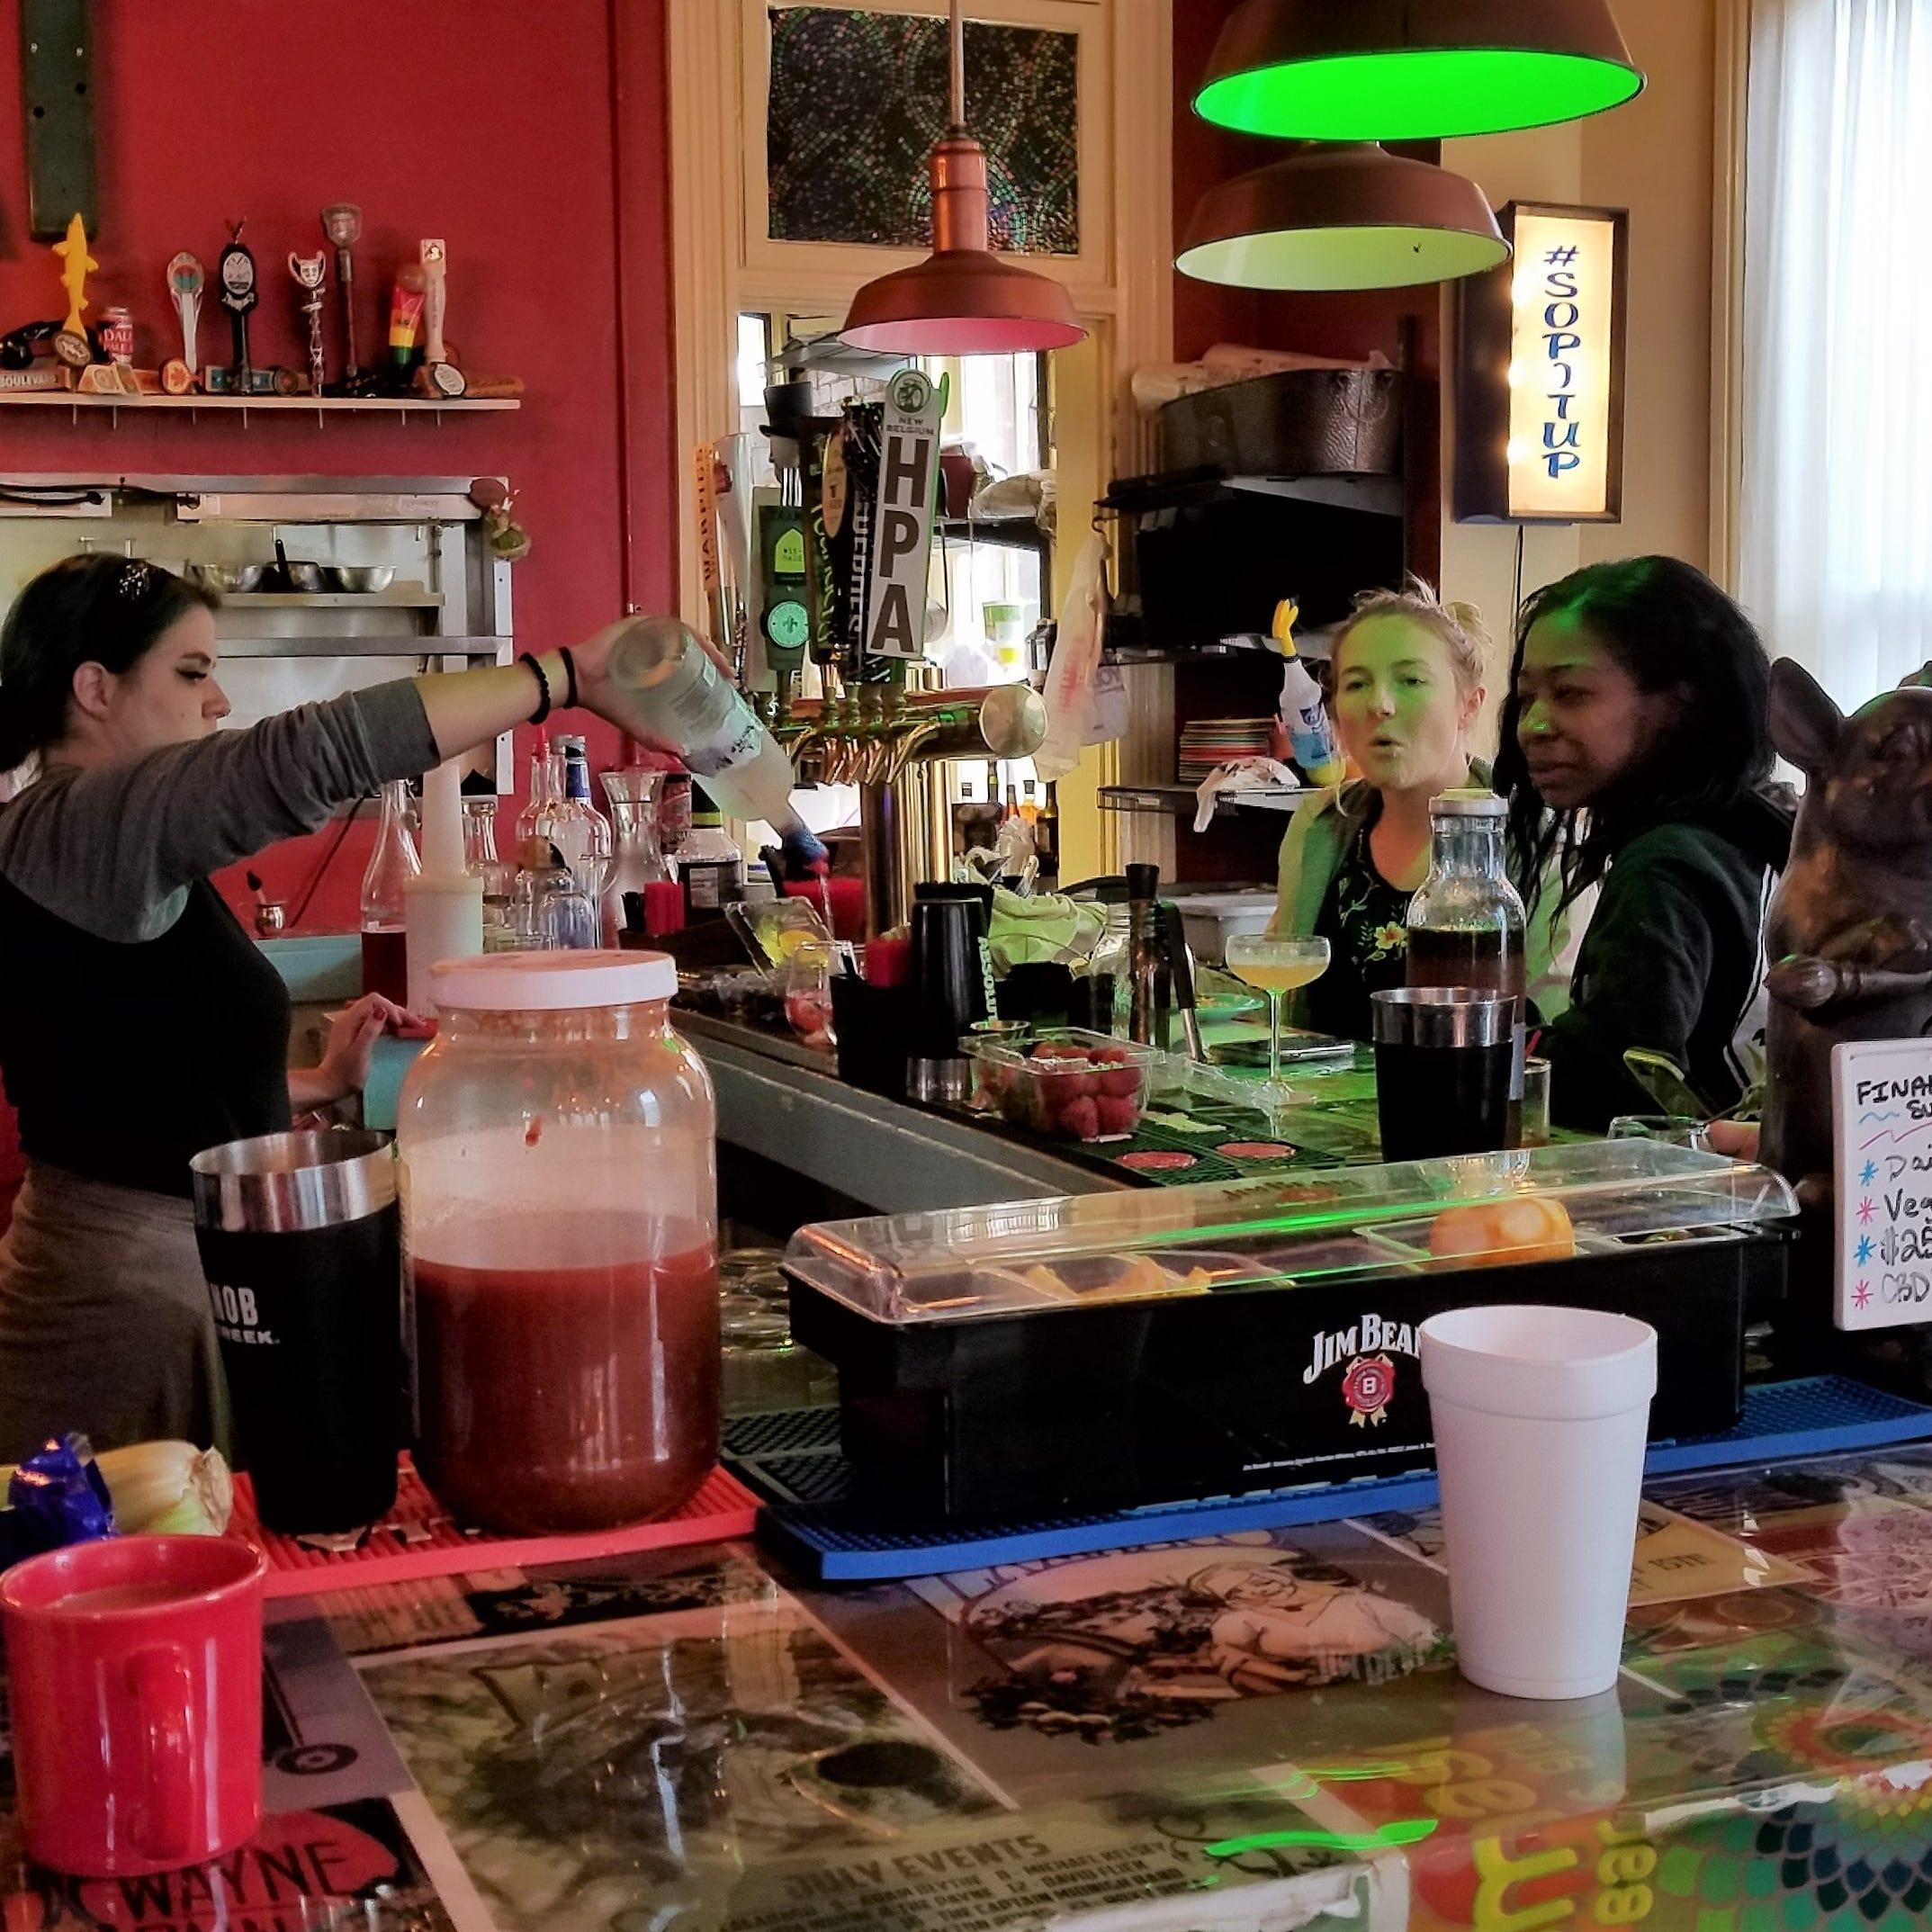 Amy Word sells Dapper Pig at Haynie's Corner, it will remain a restaurant